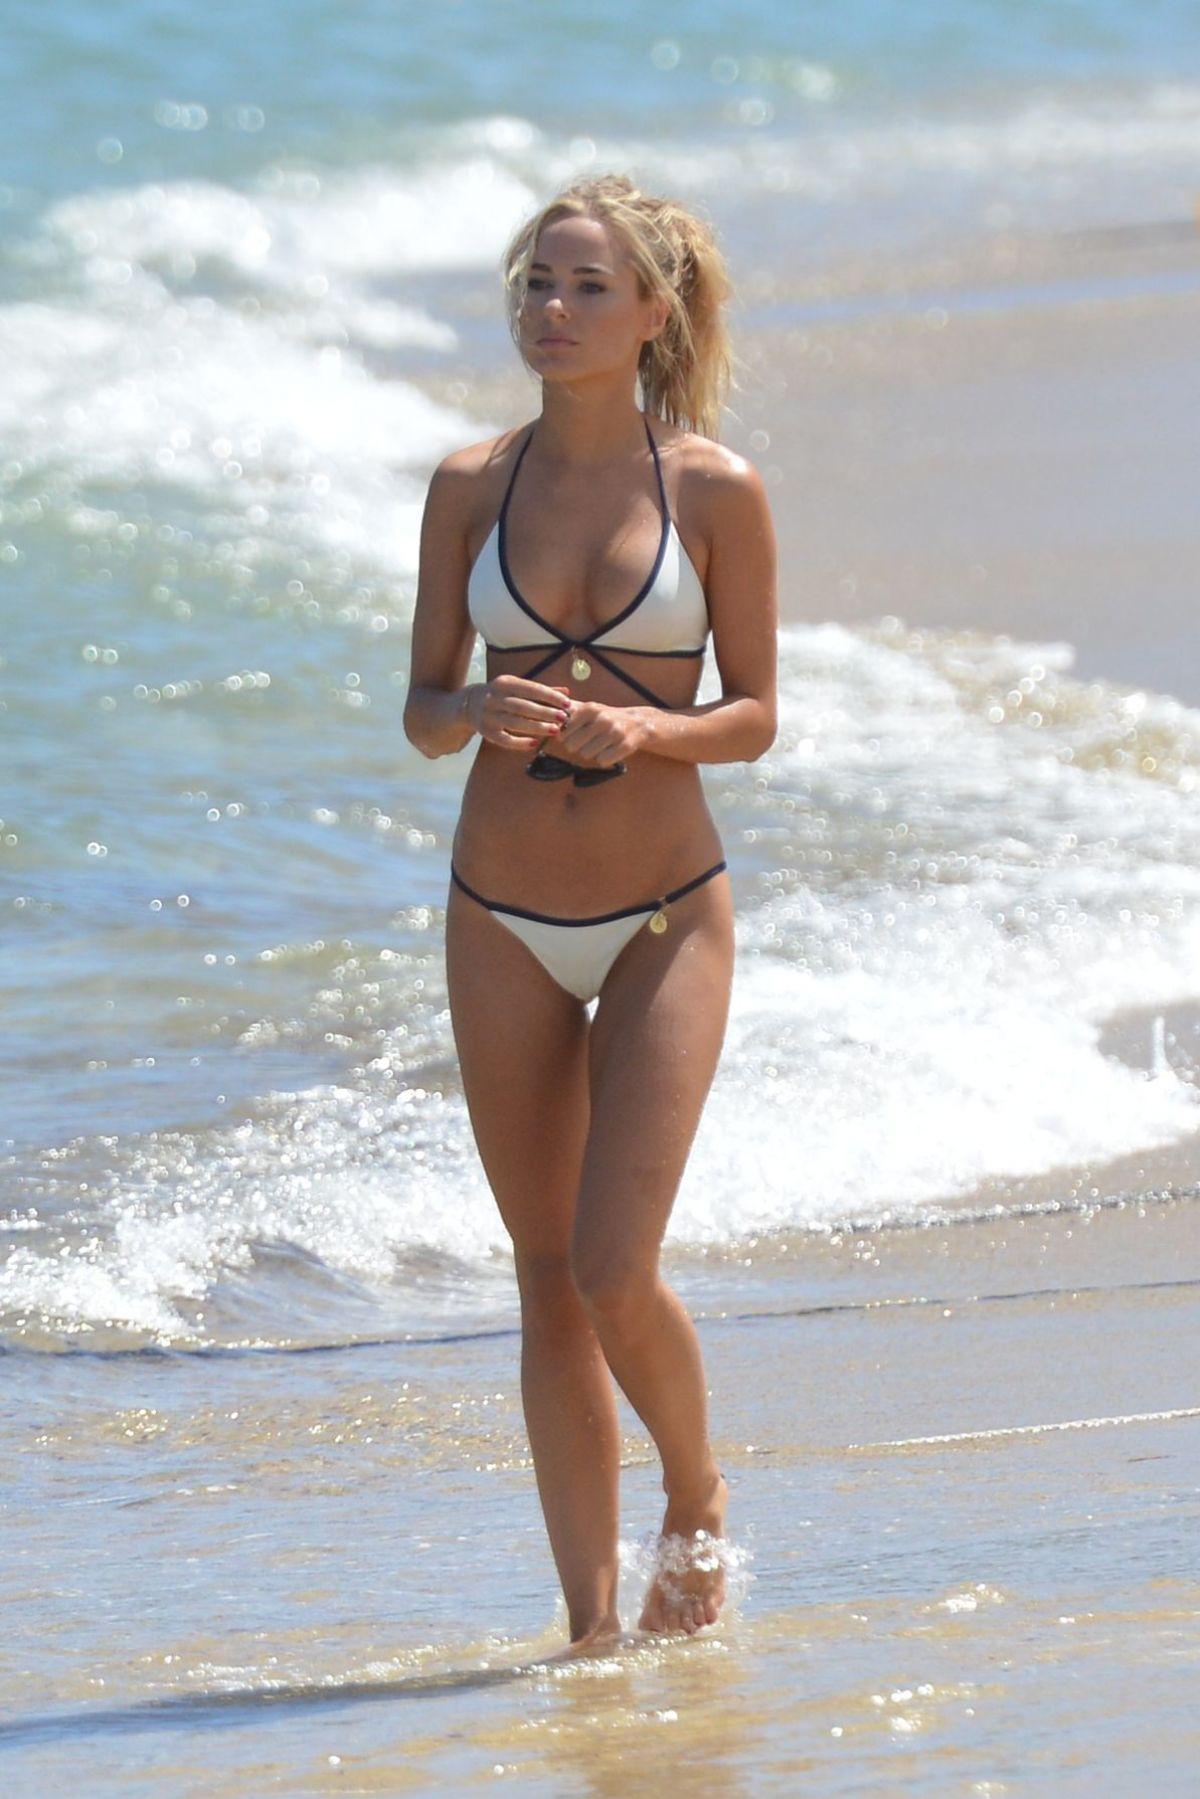 e6389d6f75735 KIMBERLEY GARNER in Bikini at a Beach in St. Tropez